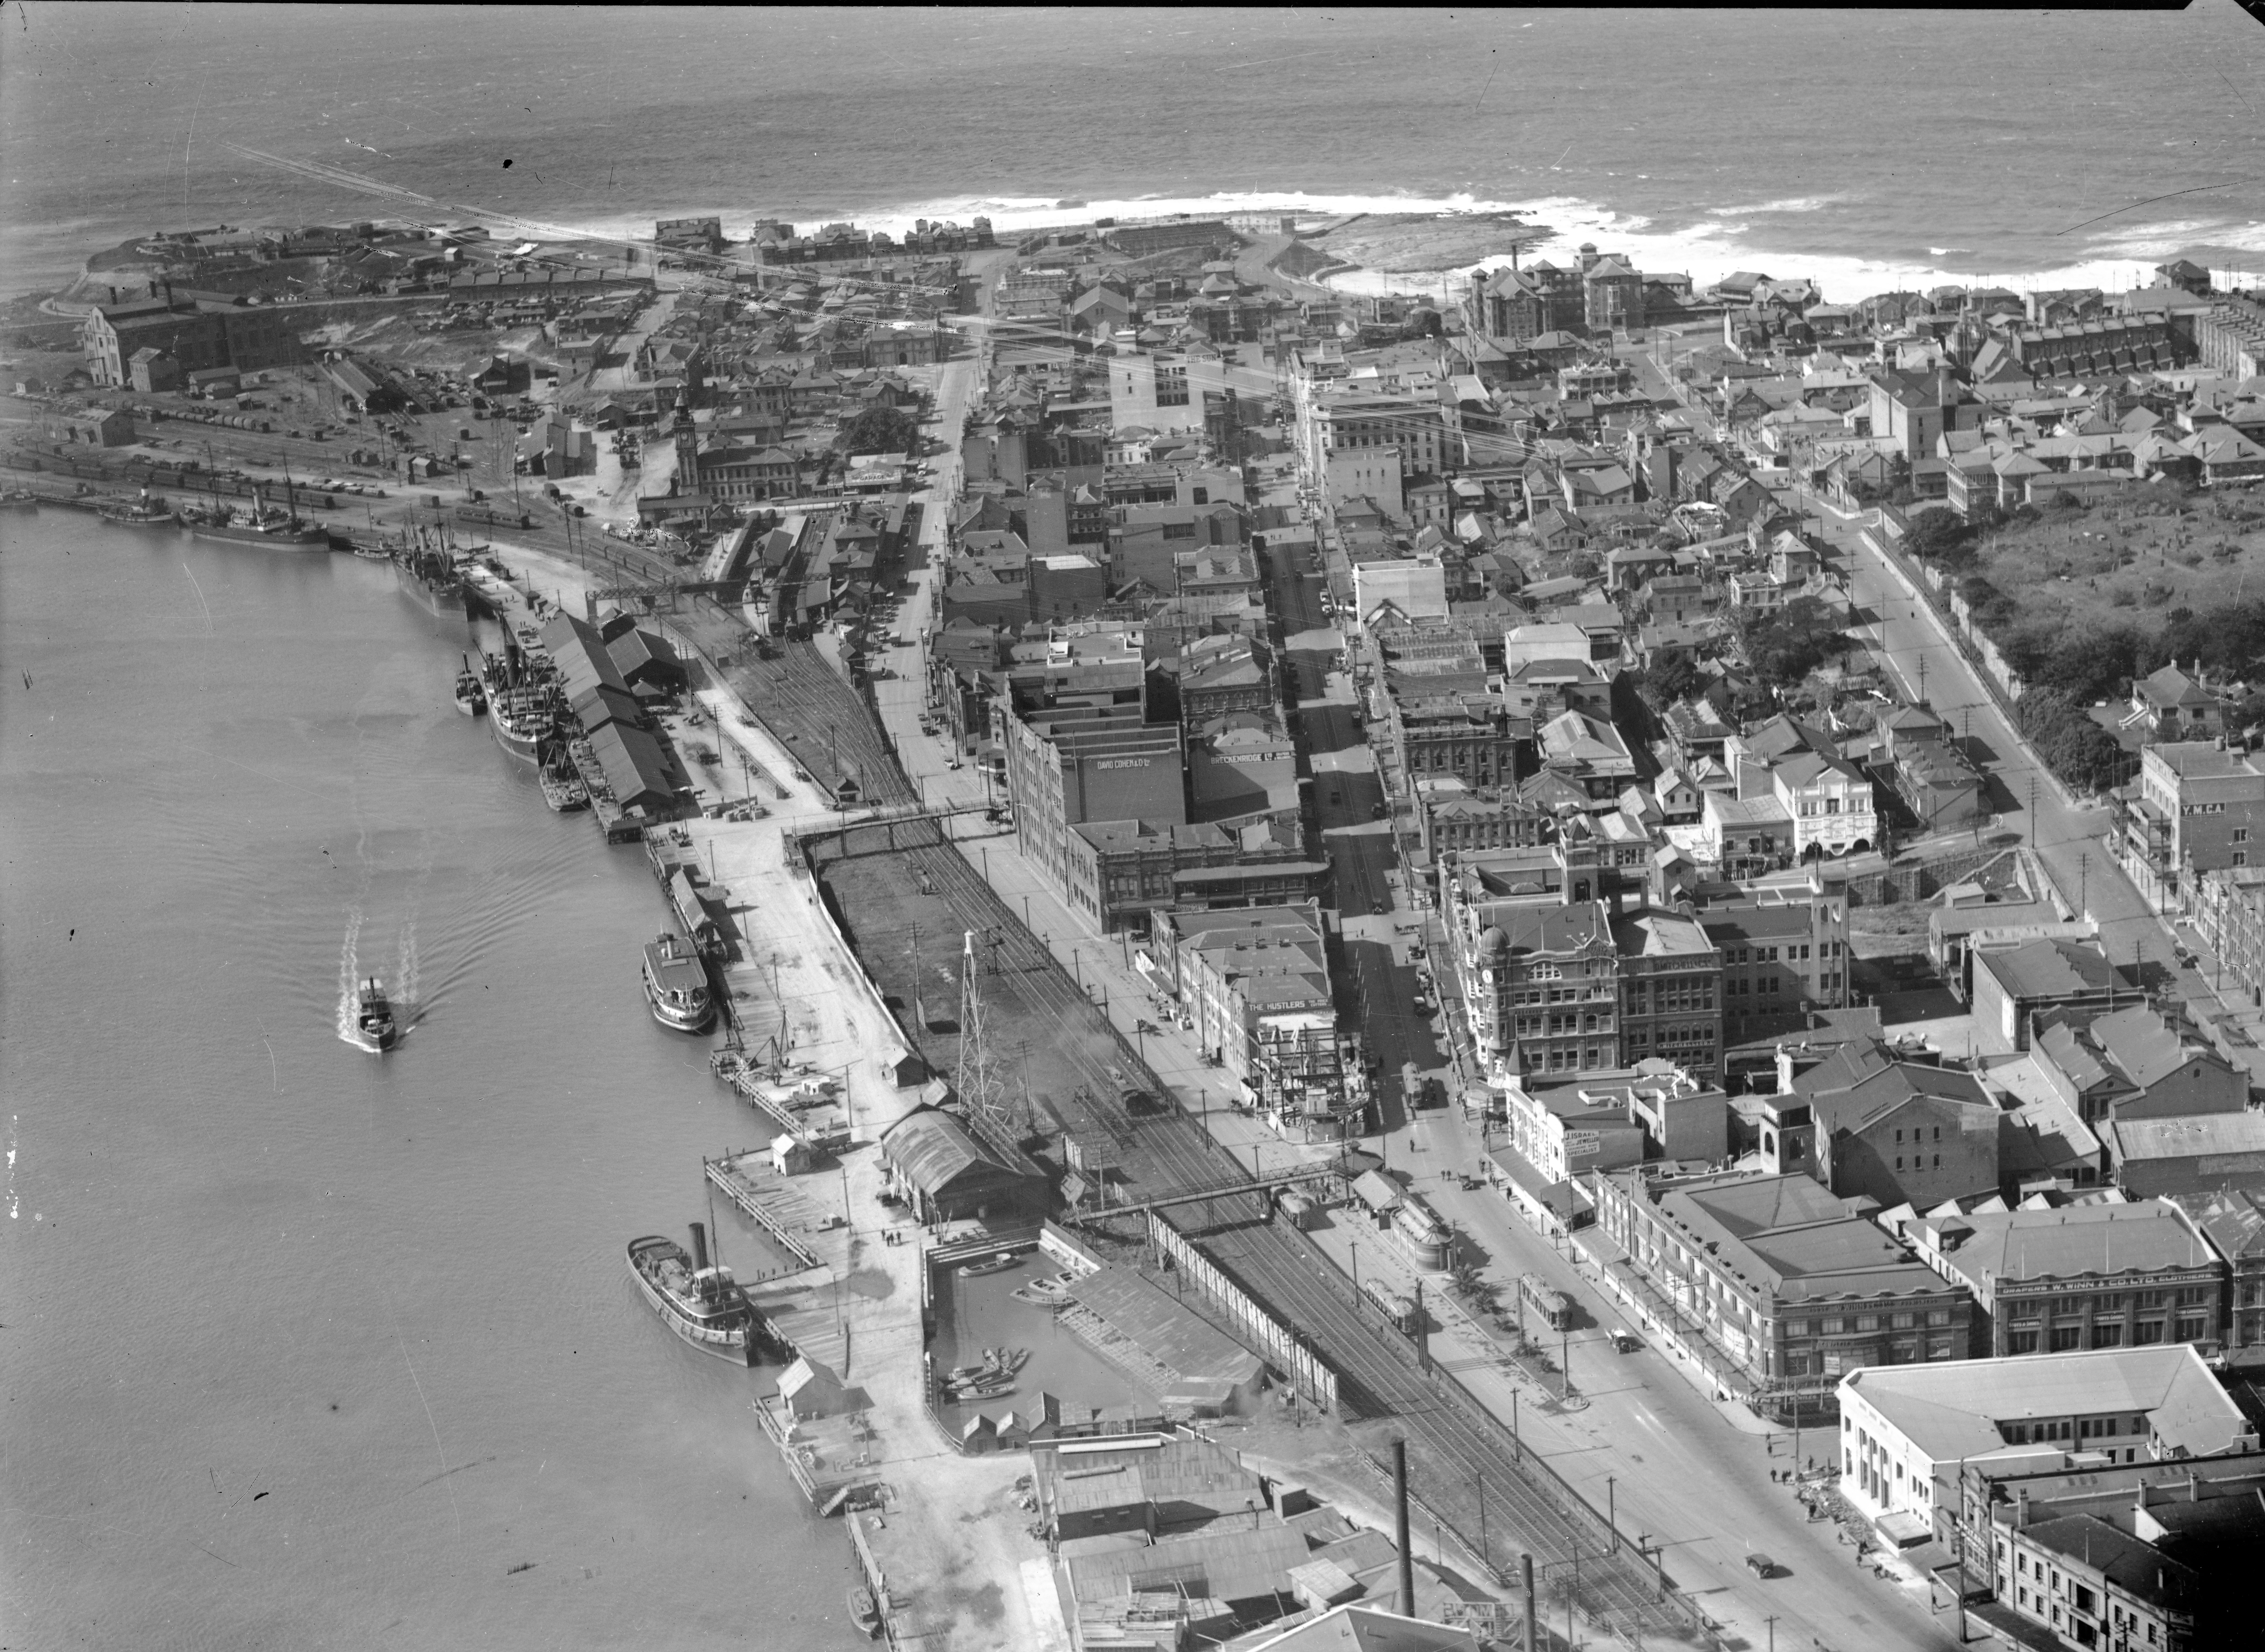 Aerial Image of Newcastle taken around 1928.